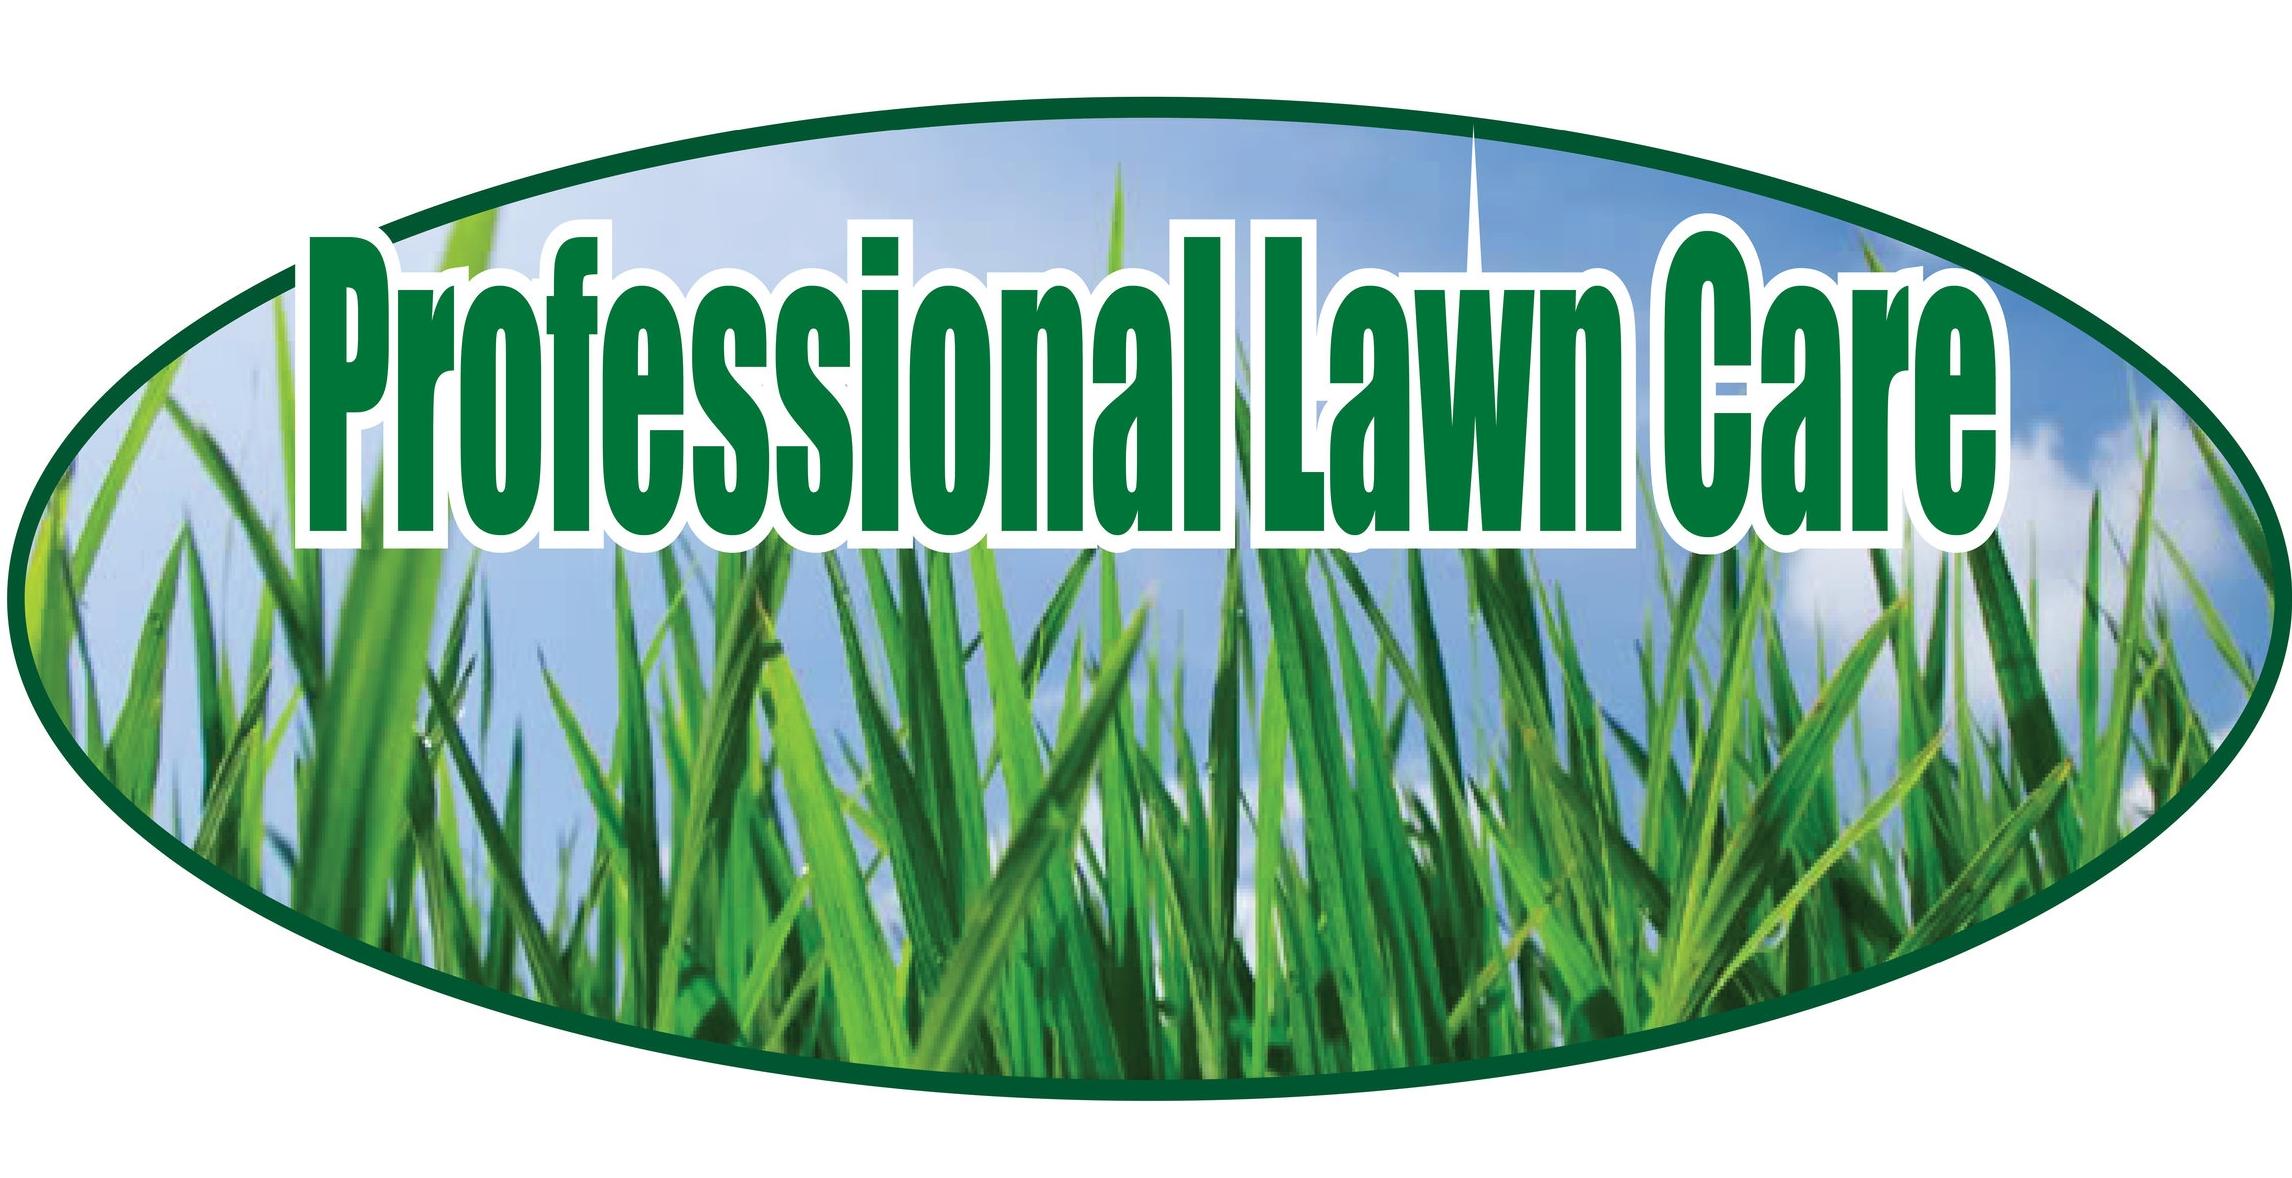 Professional Lawn Care.jpg